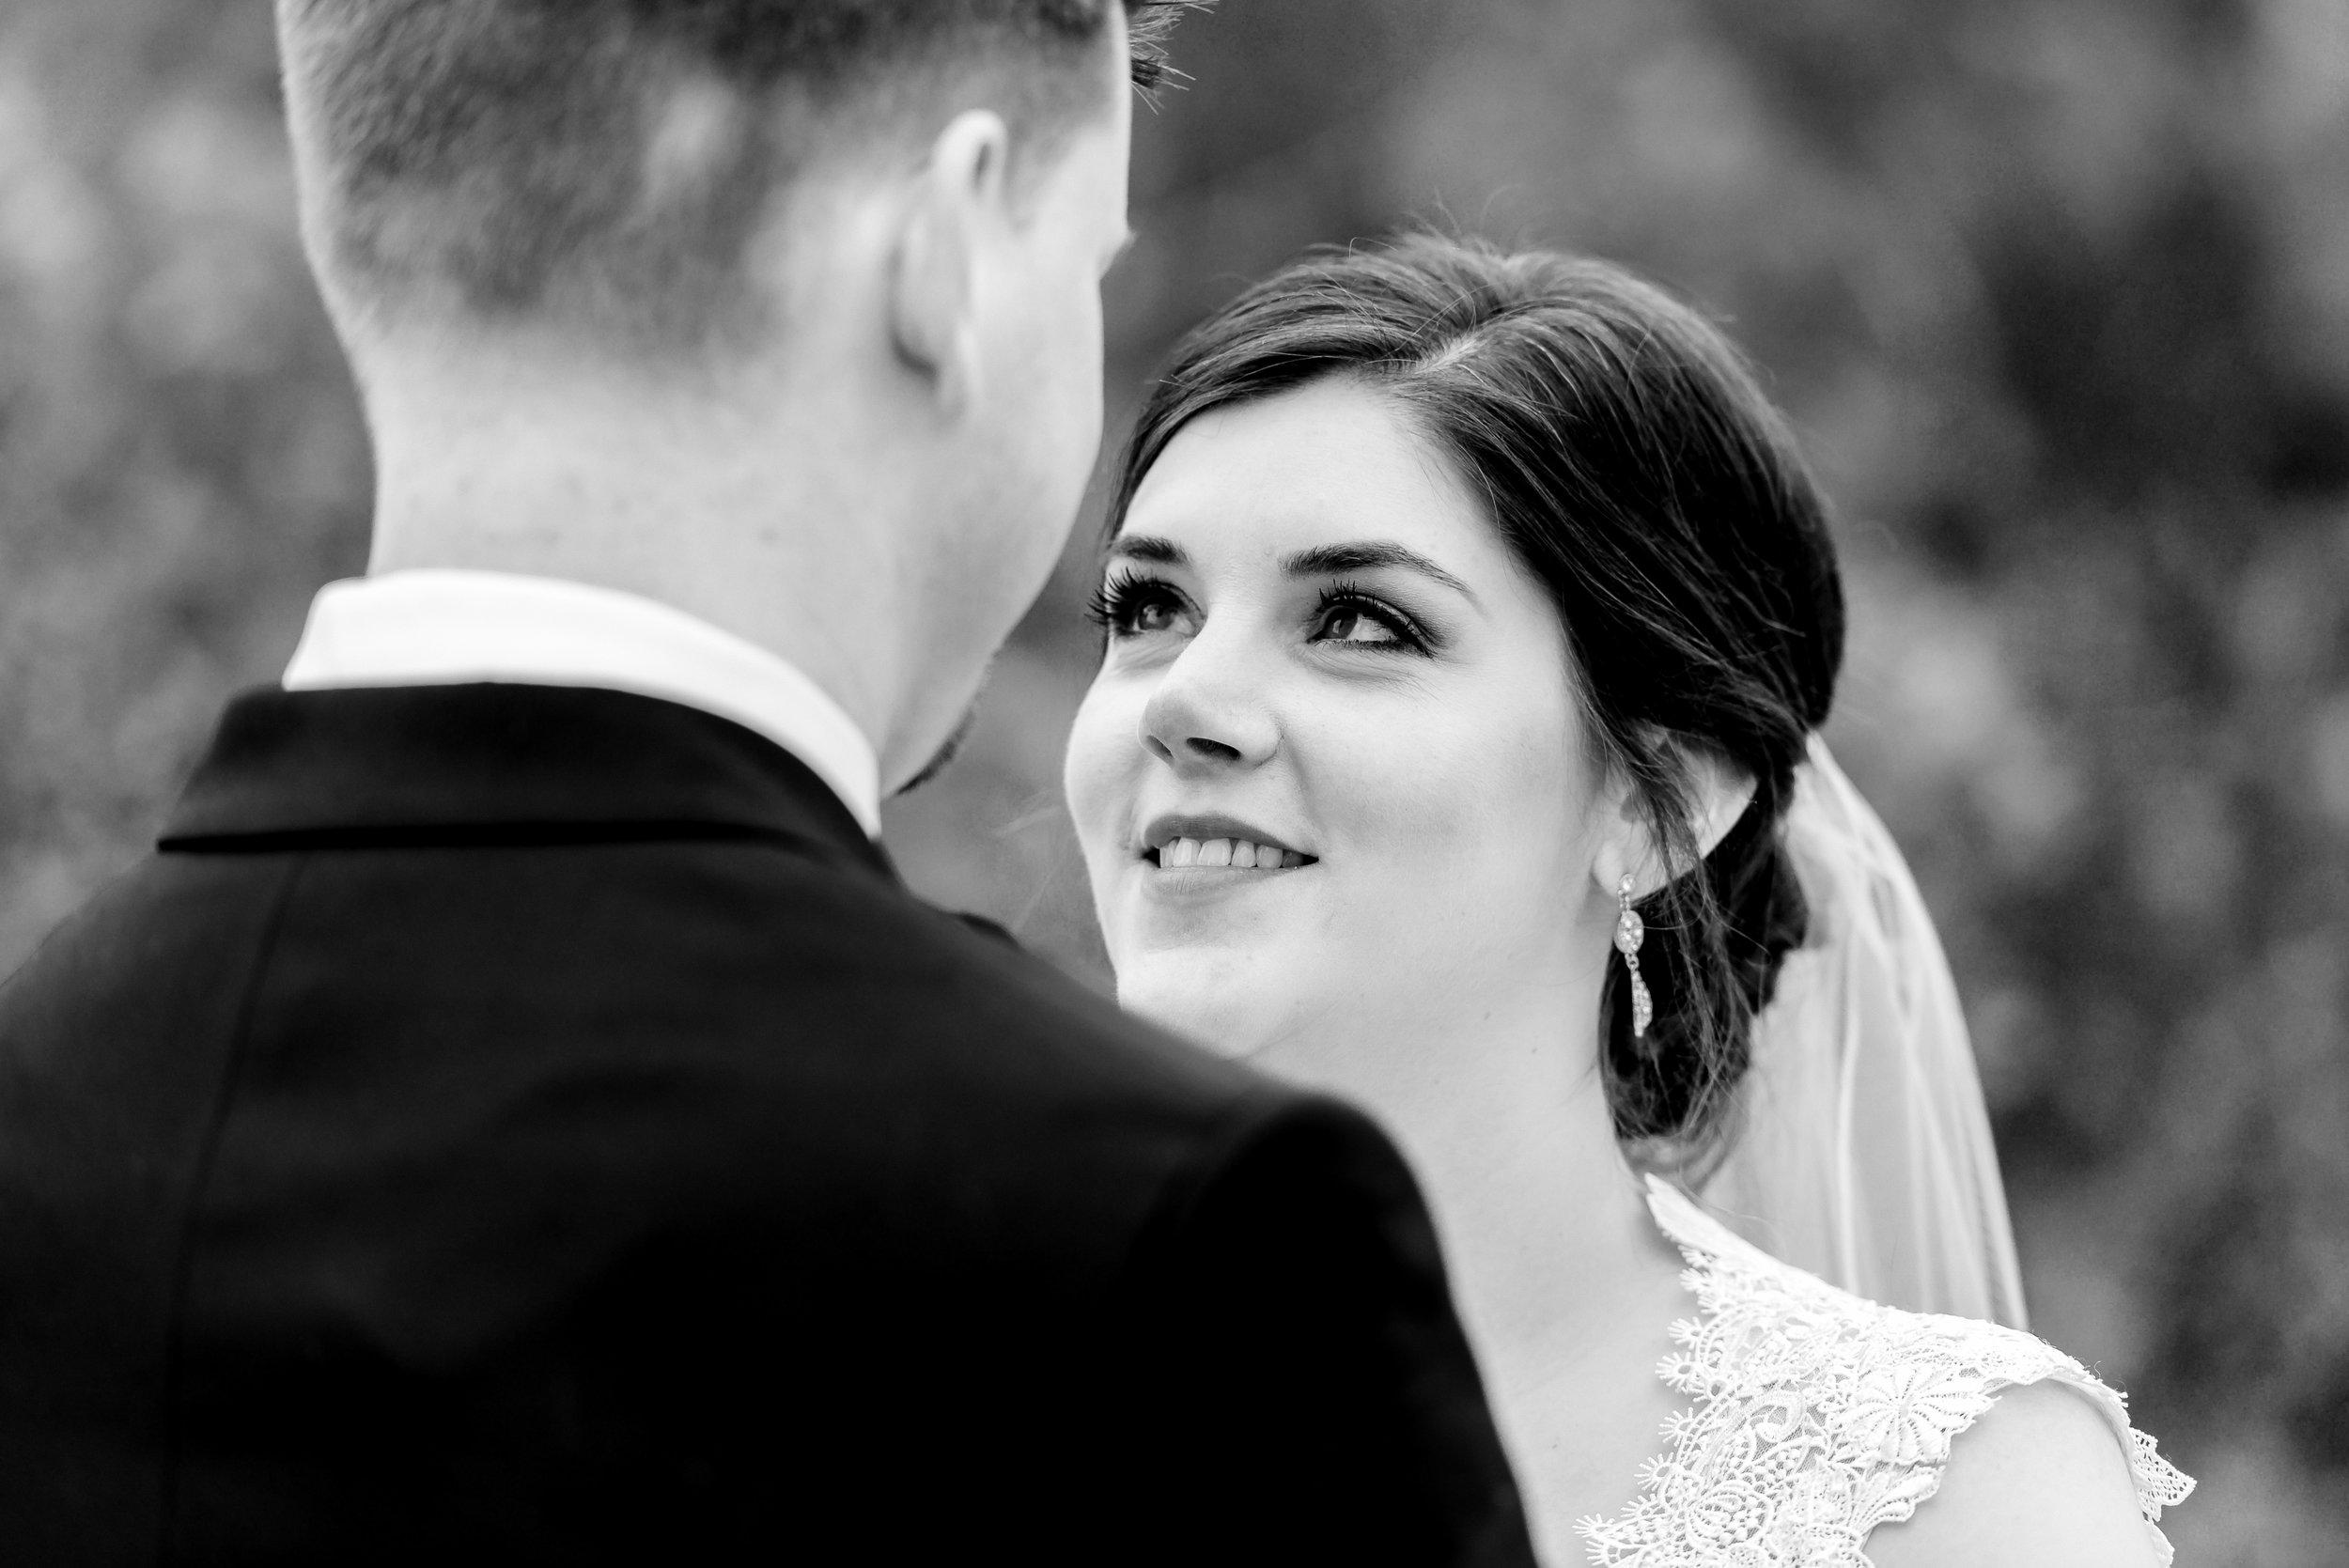 Lauren and Karl - Van Dusen Mansion Wedding and St. Olaf Catholic Church Minneapolis Wedding BW-596.jpg